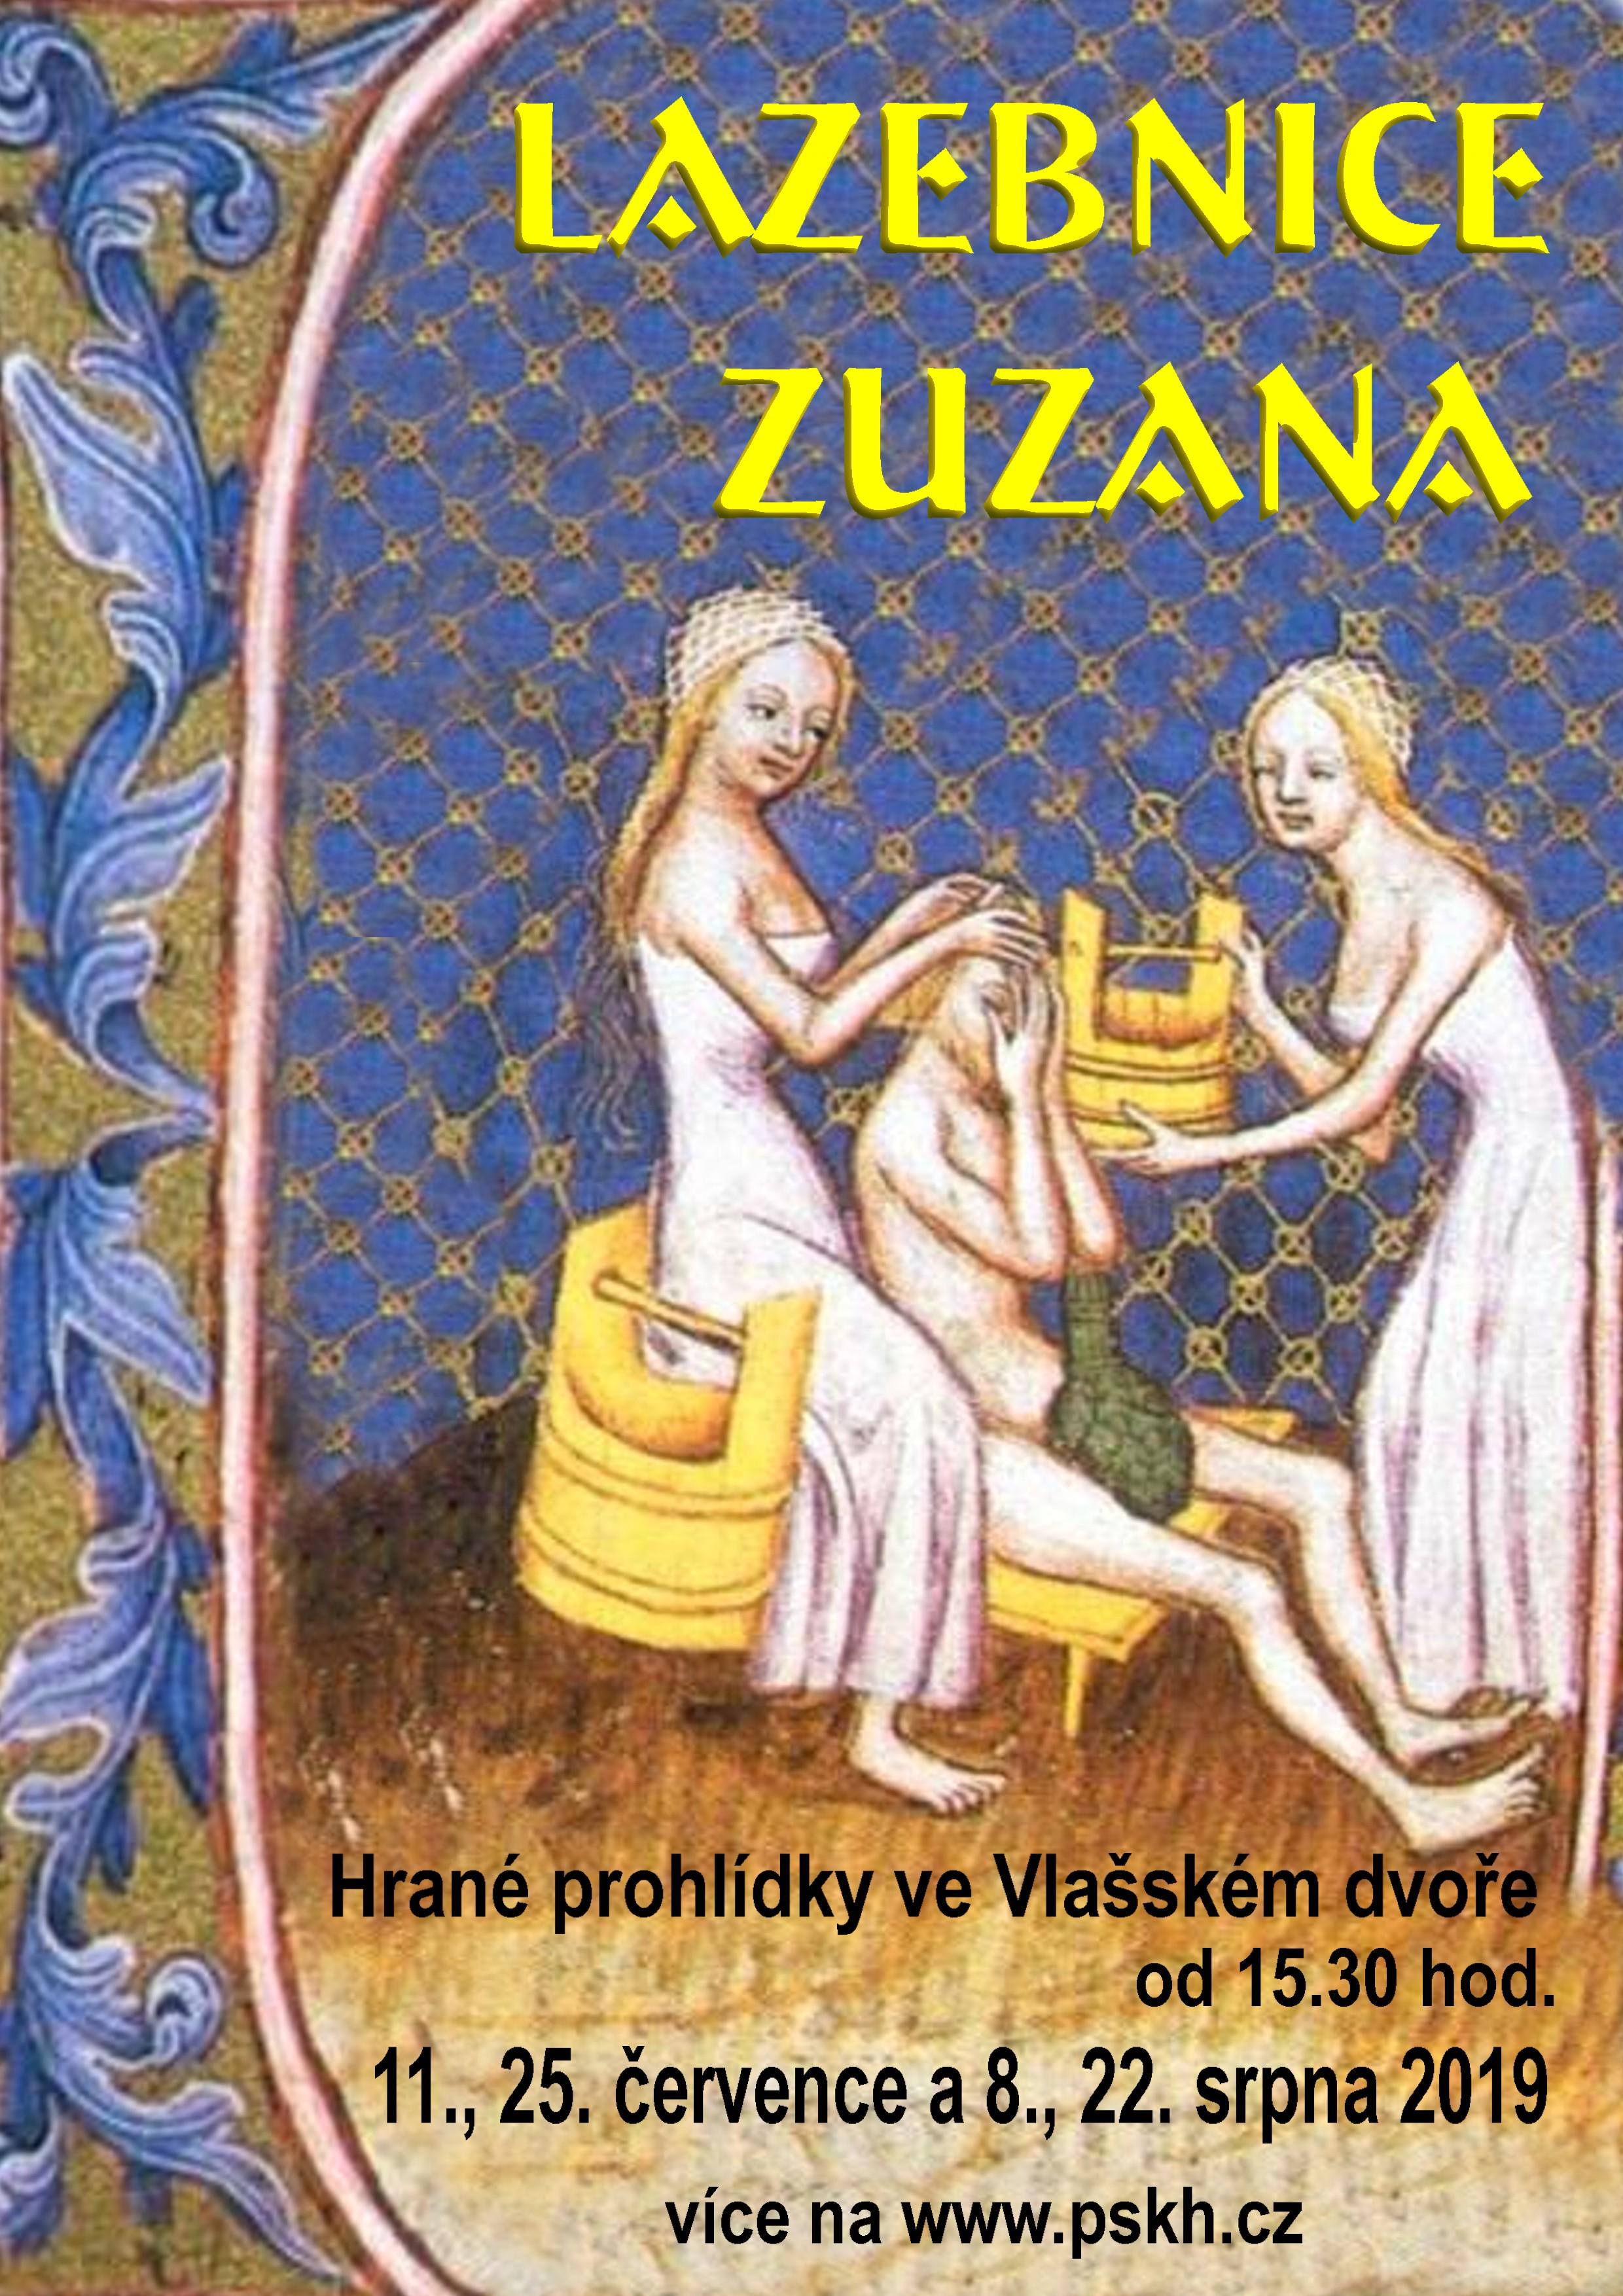 6395-lazebnice-zuzana-2019.jpg